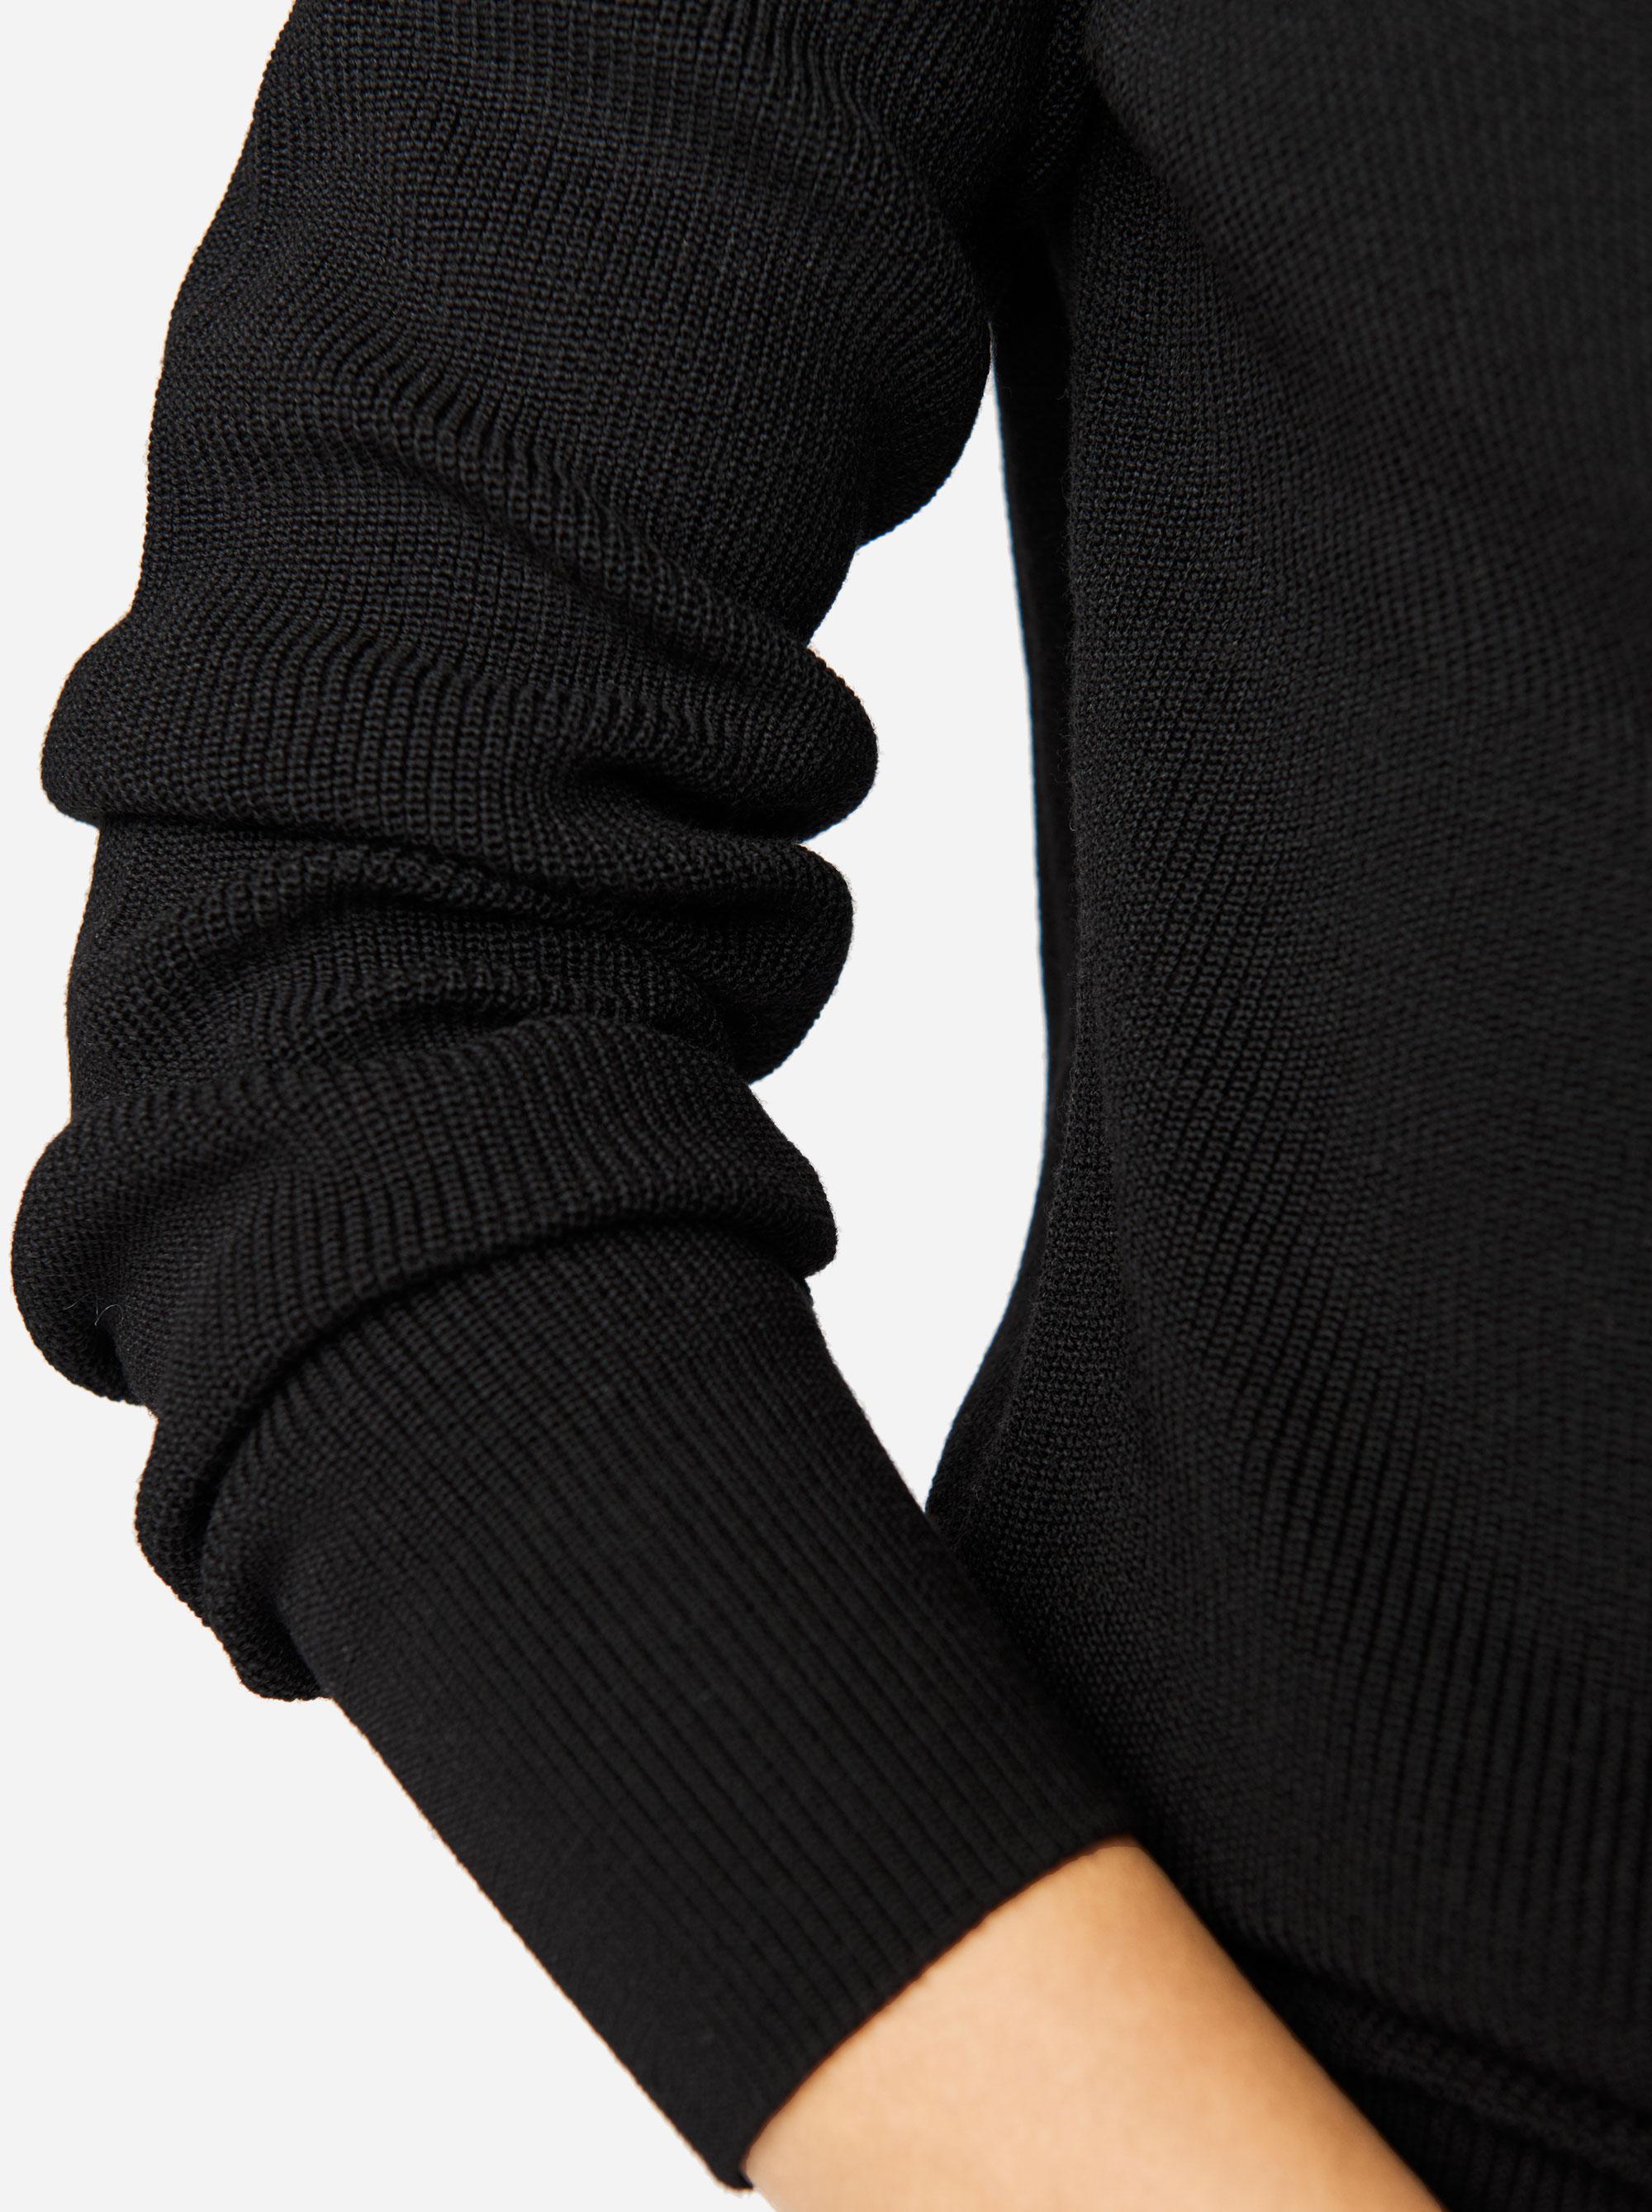 Teym - Crewneck - The Merino Sweater - Women - Black - 2